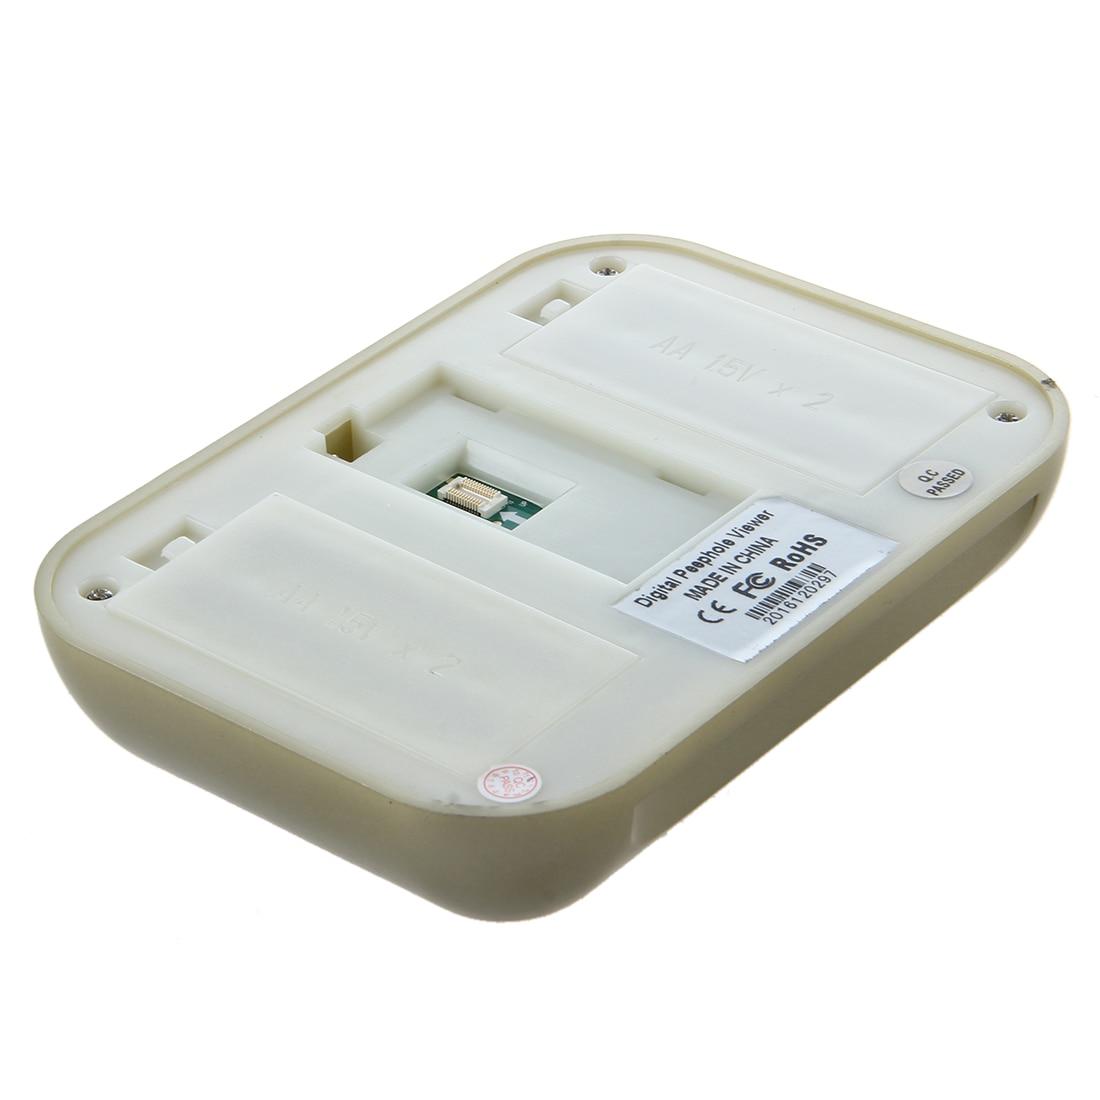 MOOL 3.5 LCD color display with video surveillance digital peephole camera doorbell<br>